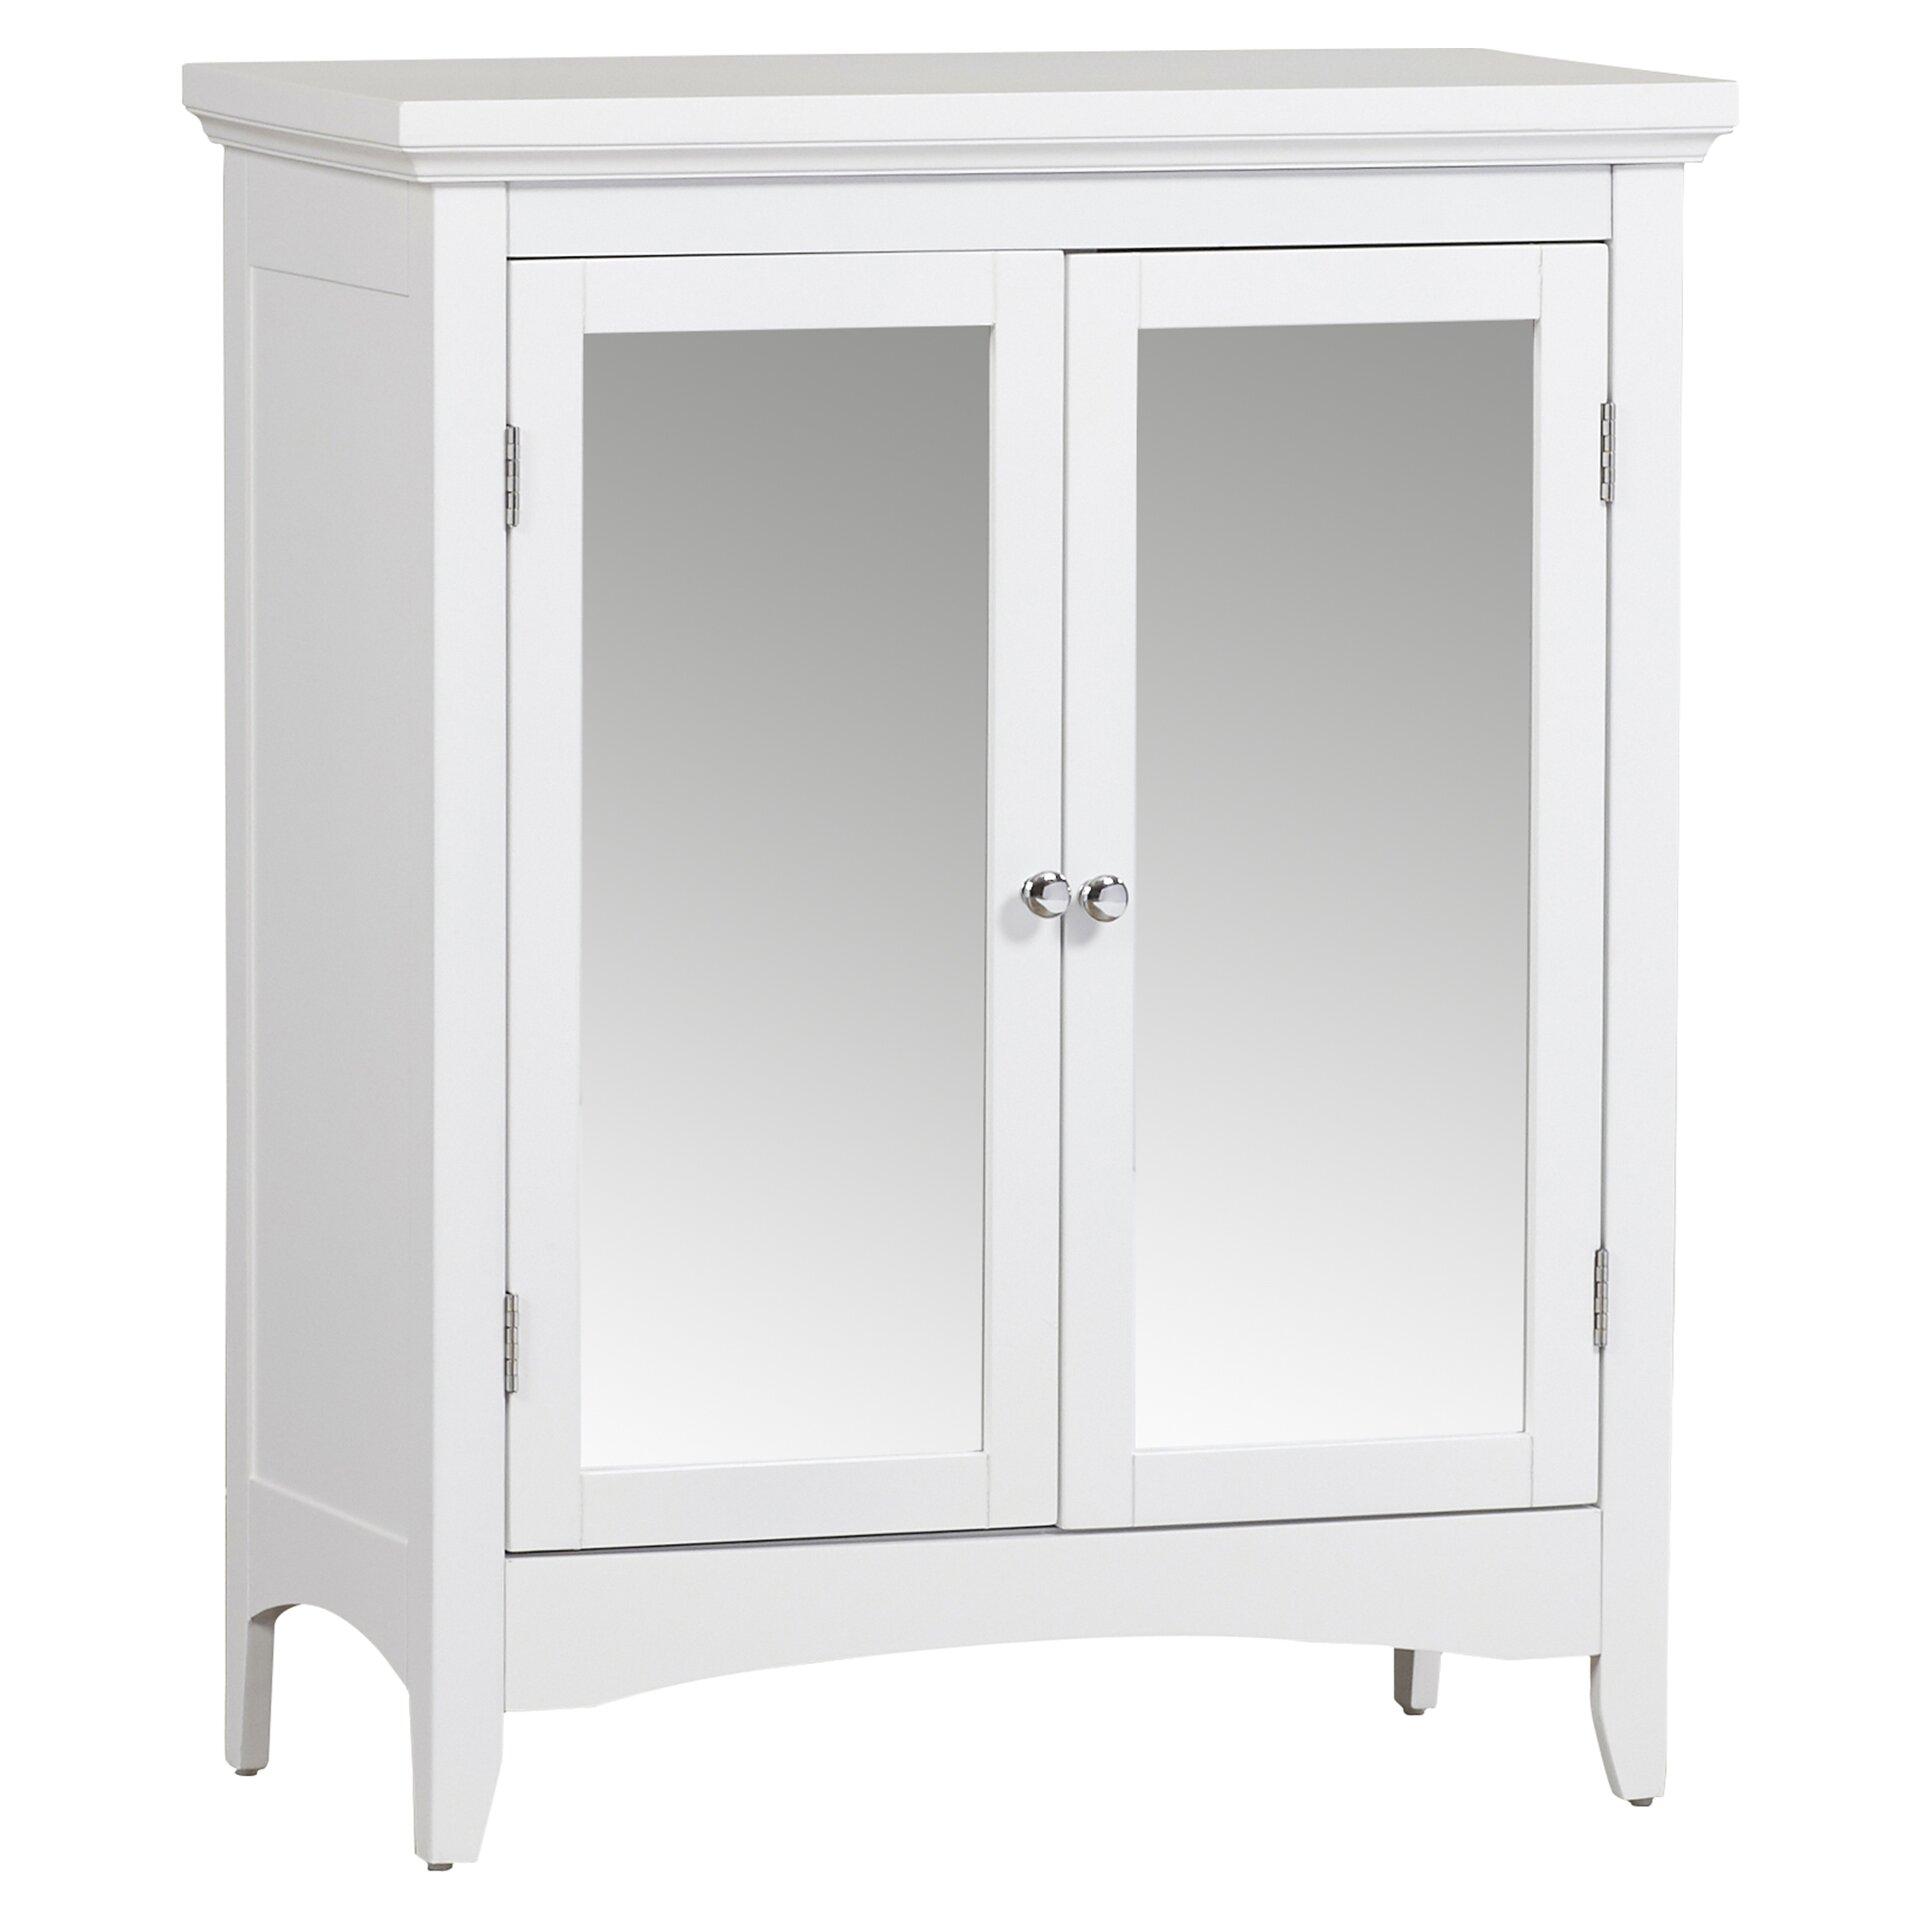 "Wayfair Free Standing Kitchen Cabinets: Alcott Hill Langport 26"" X 32"" Free Standing Cabinet"